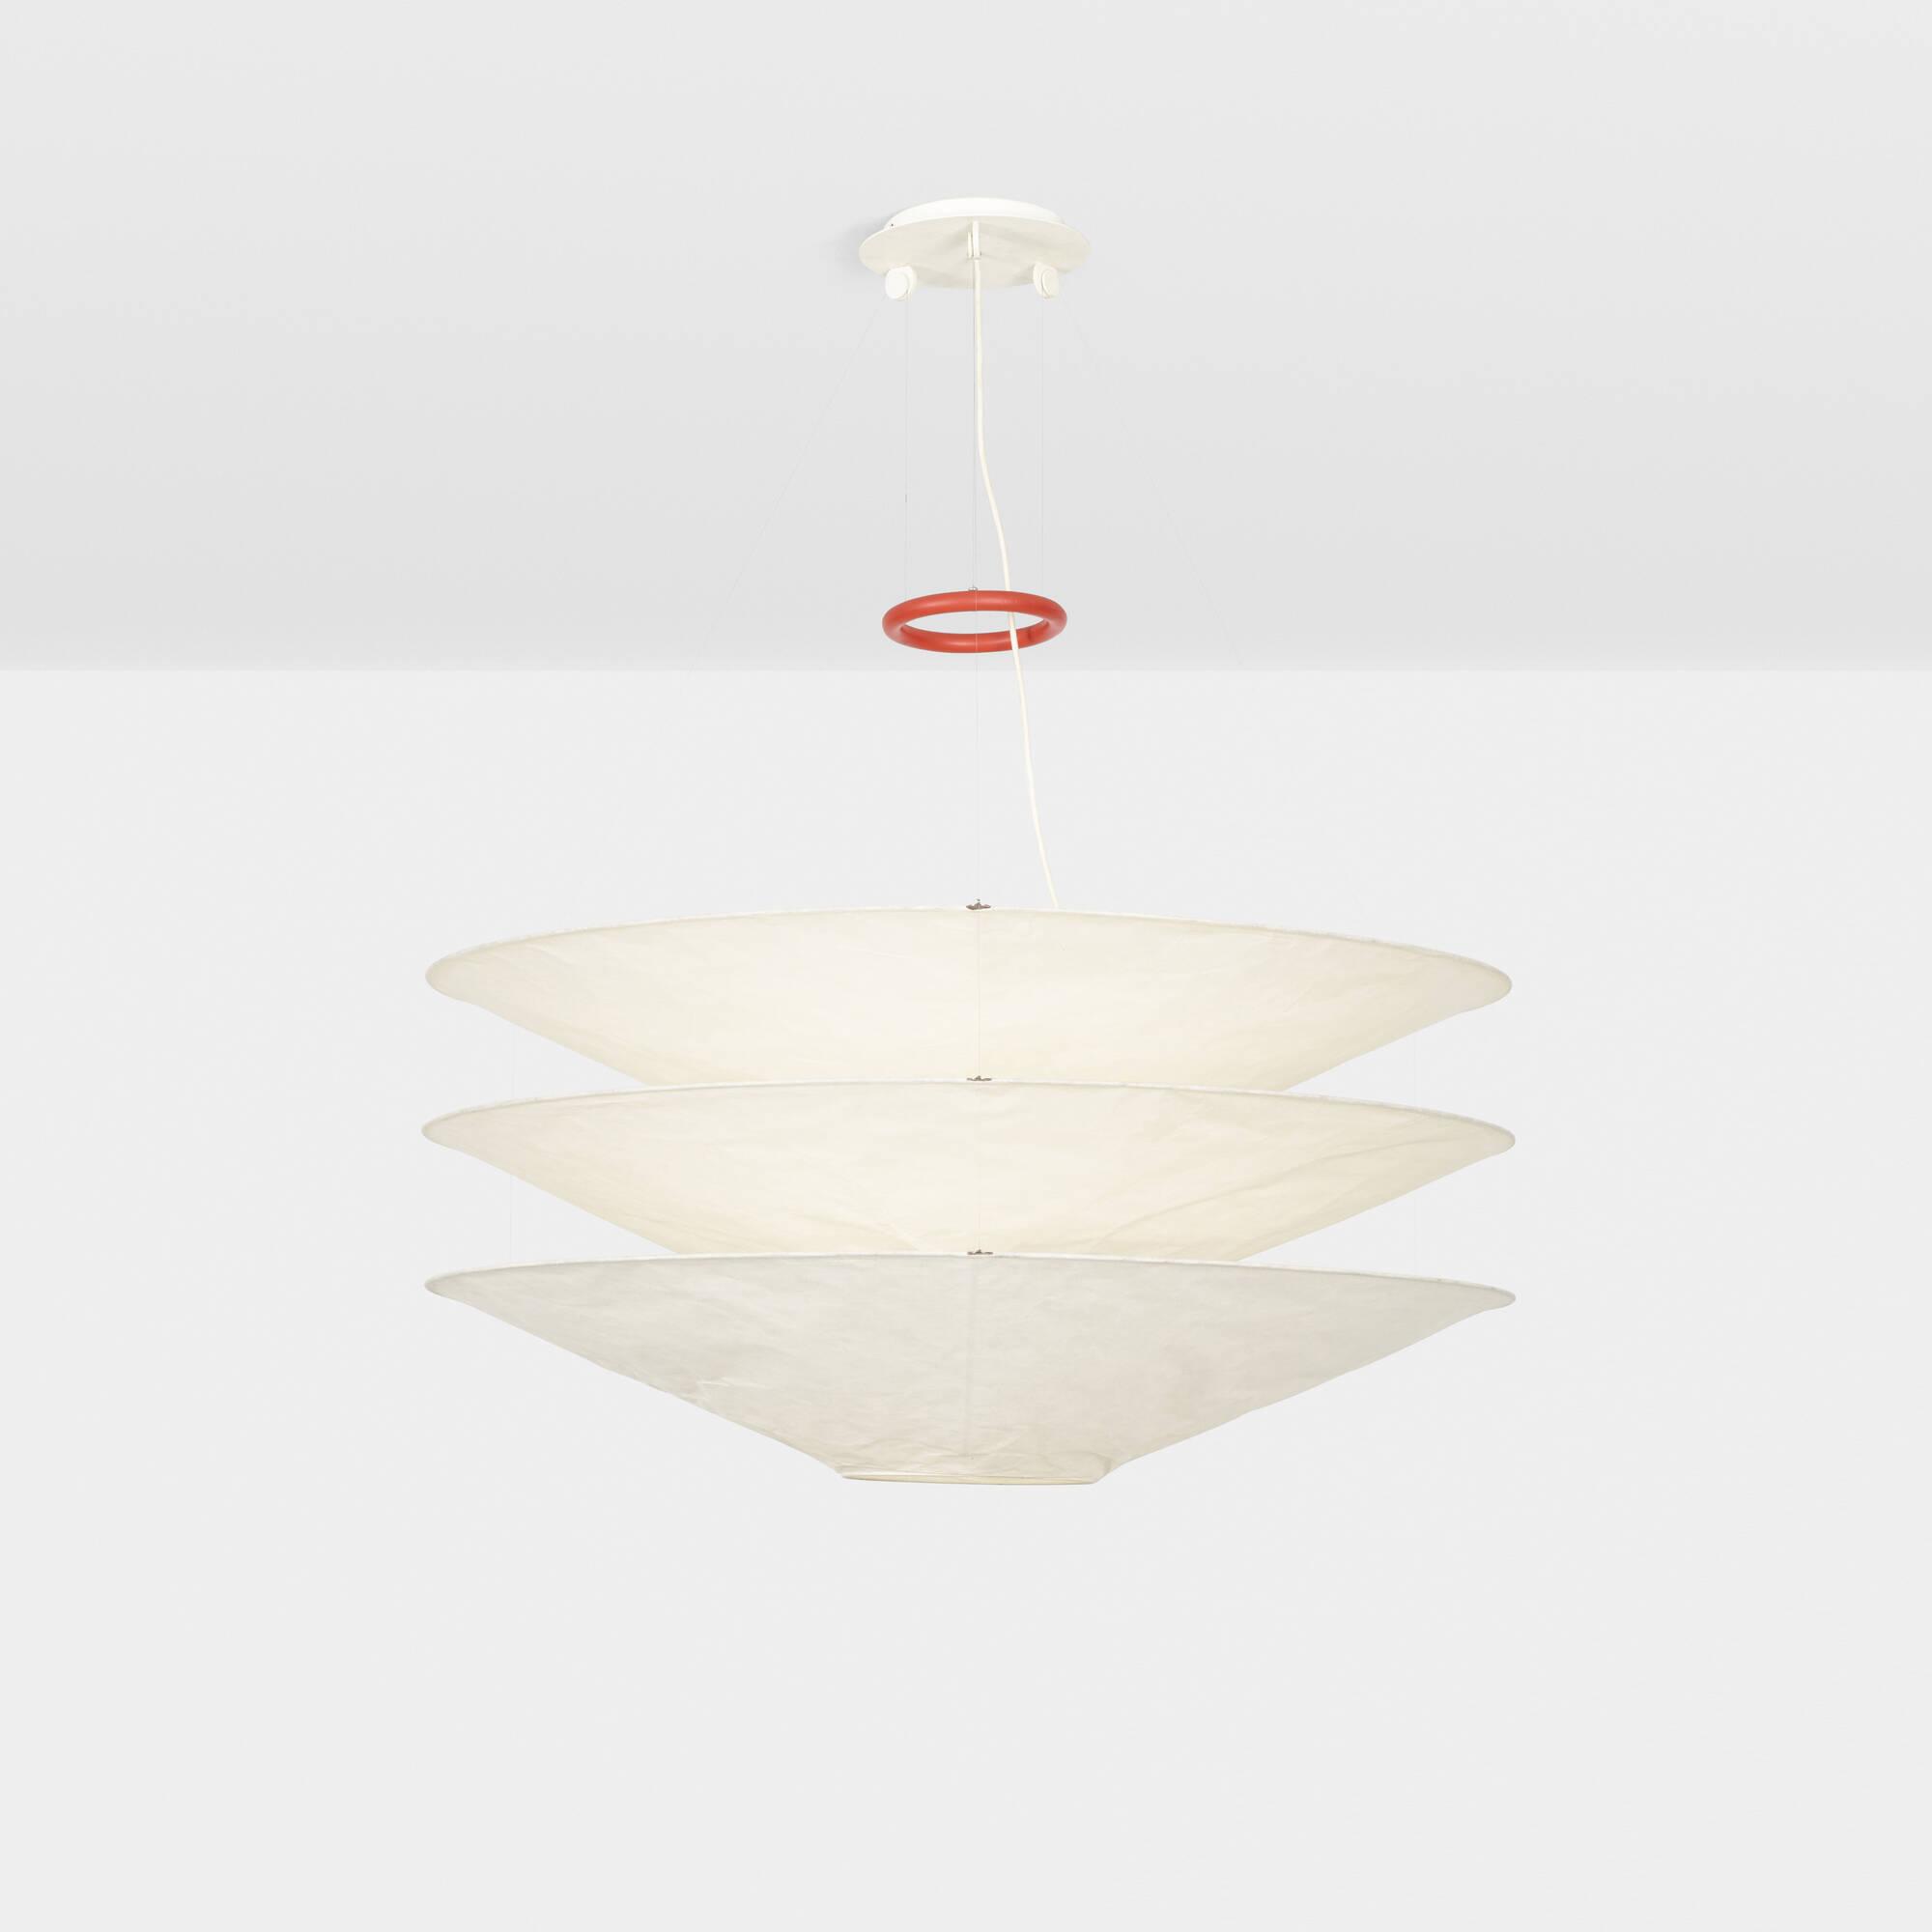 551: Ingo Maurer / Floatation chandelier (1 of 1)